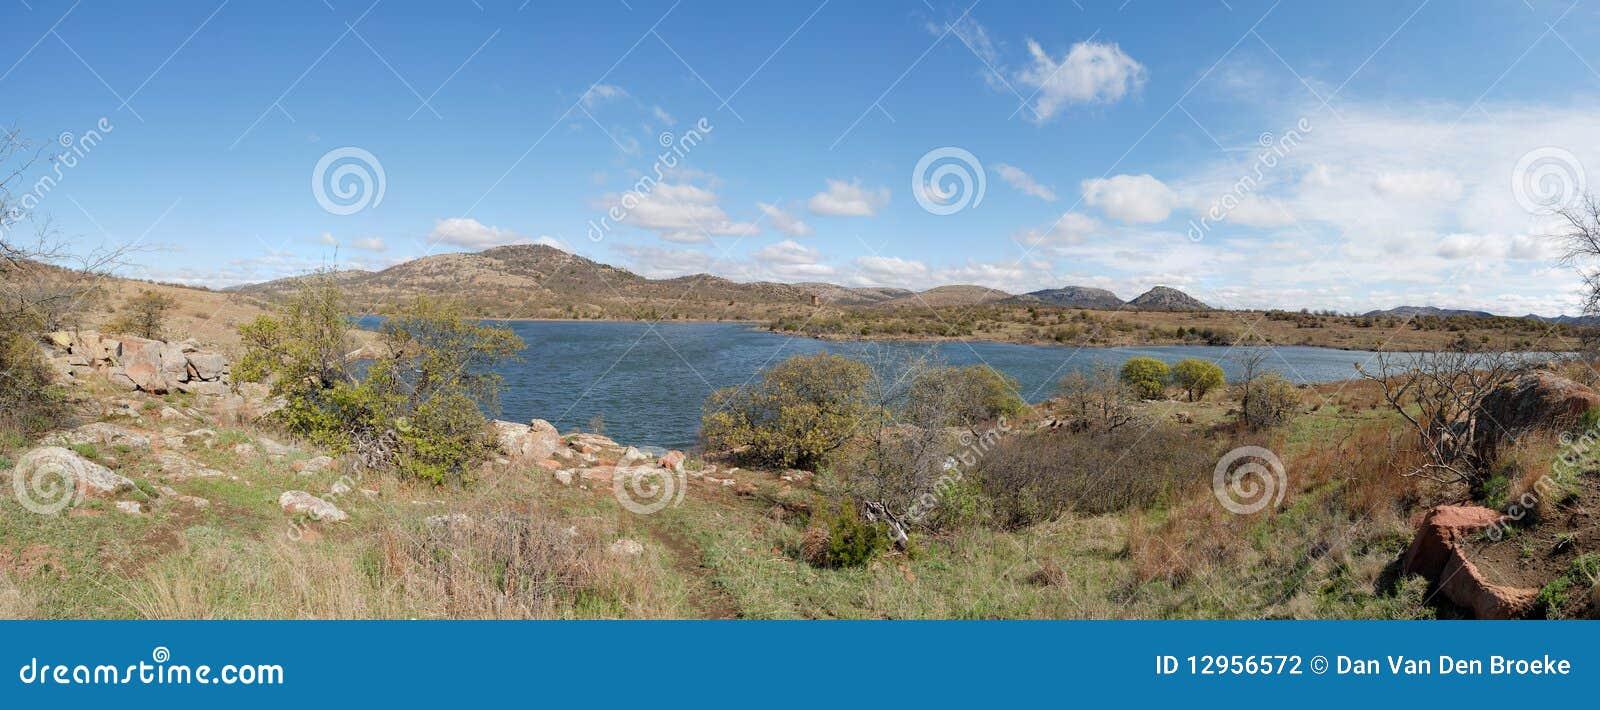 Jed johnson λίμνη